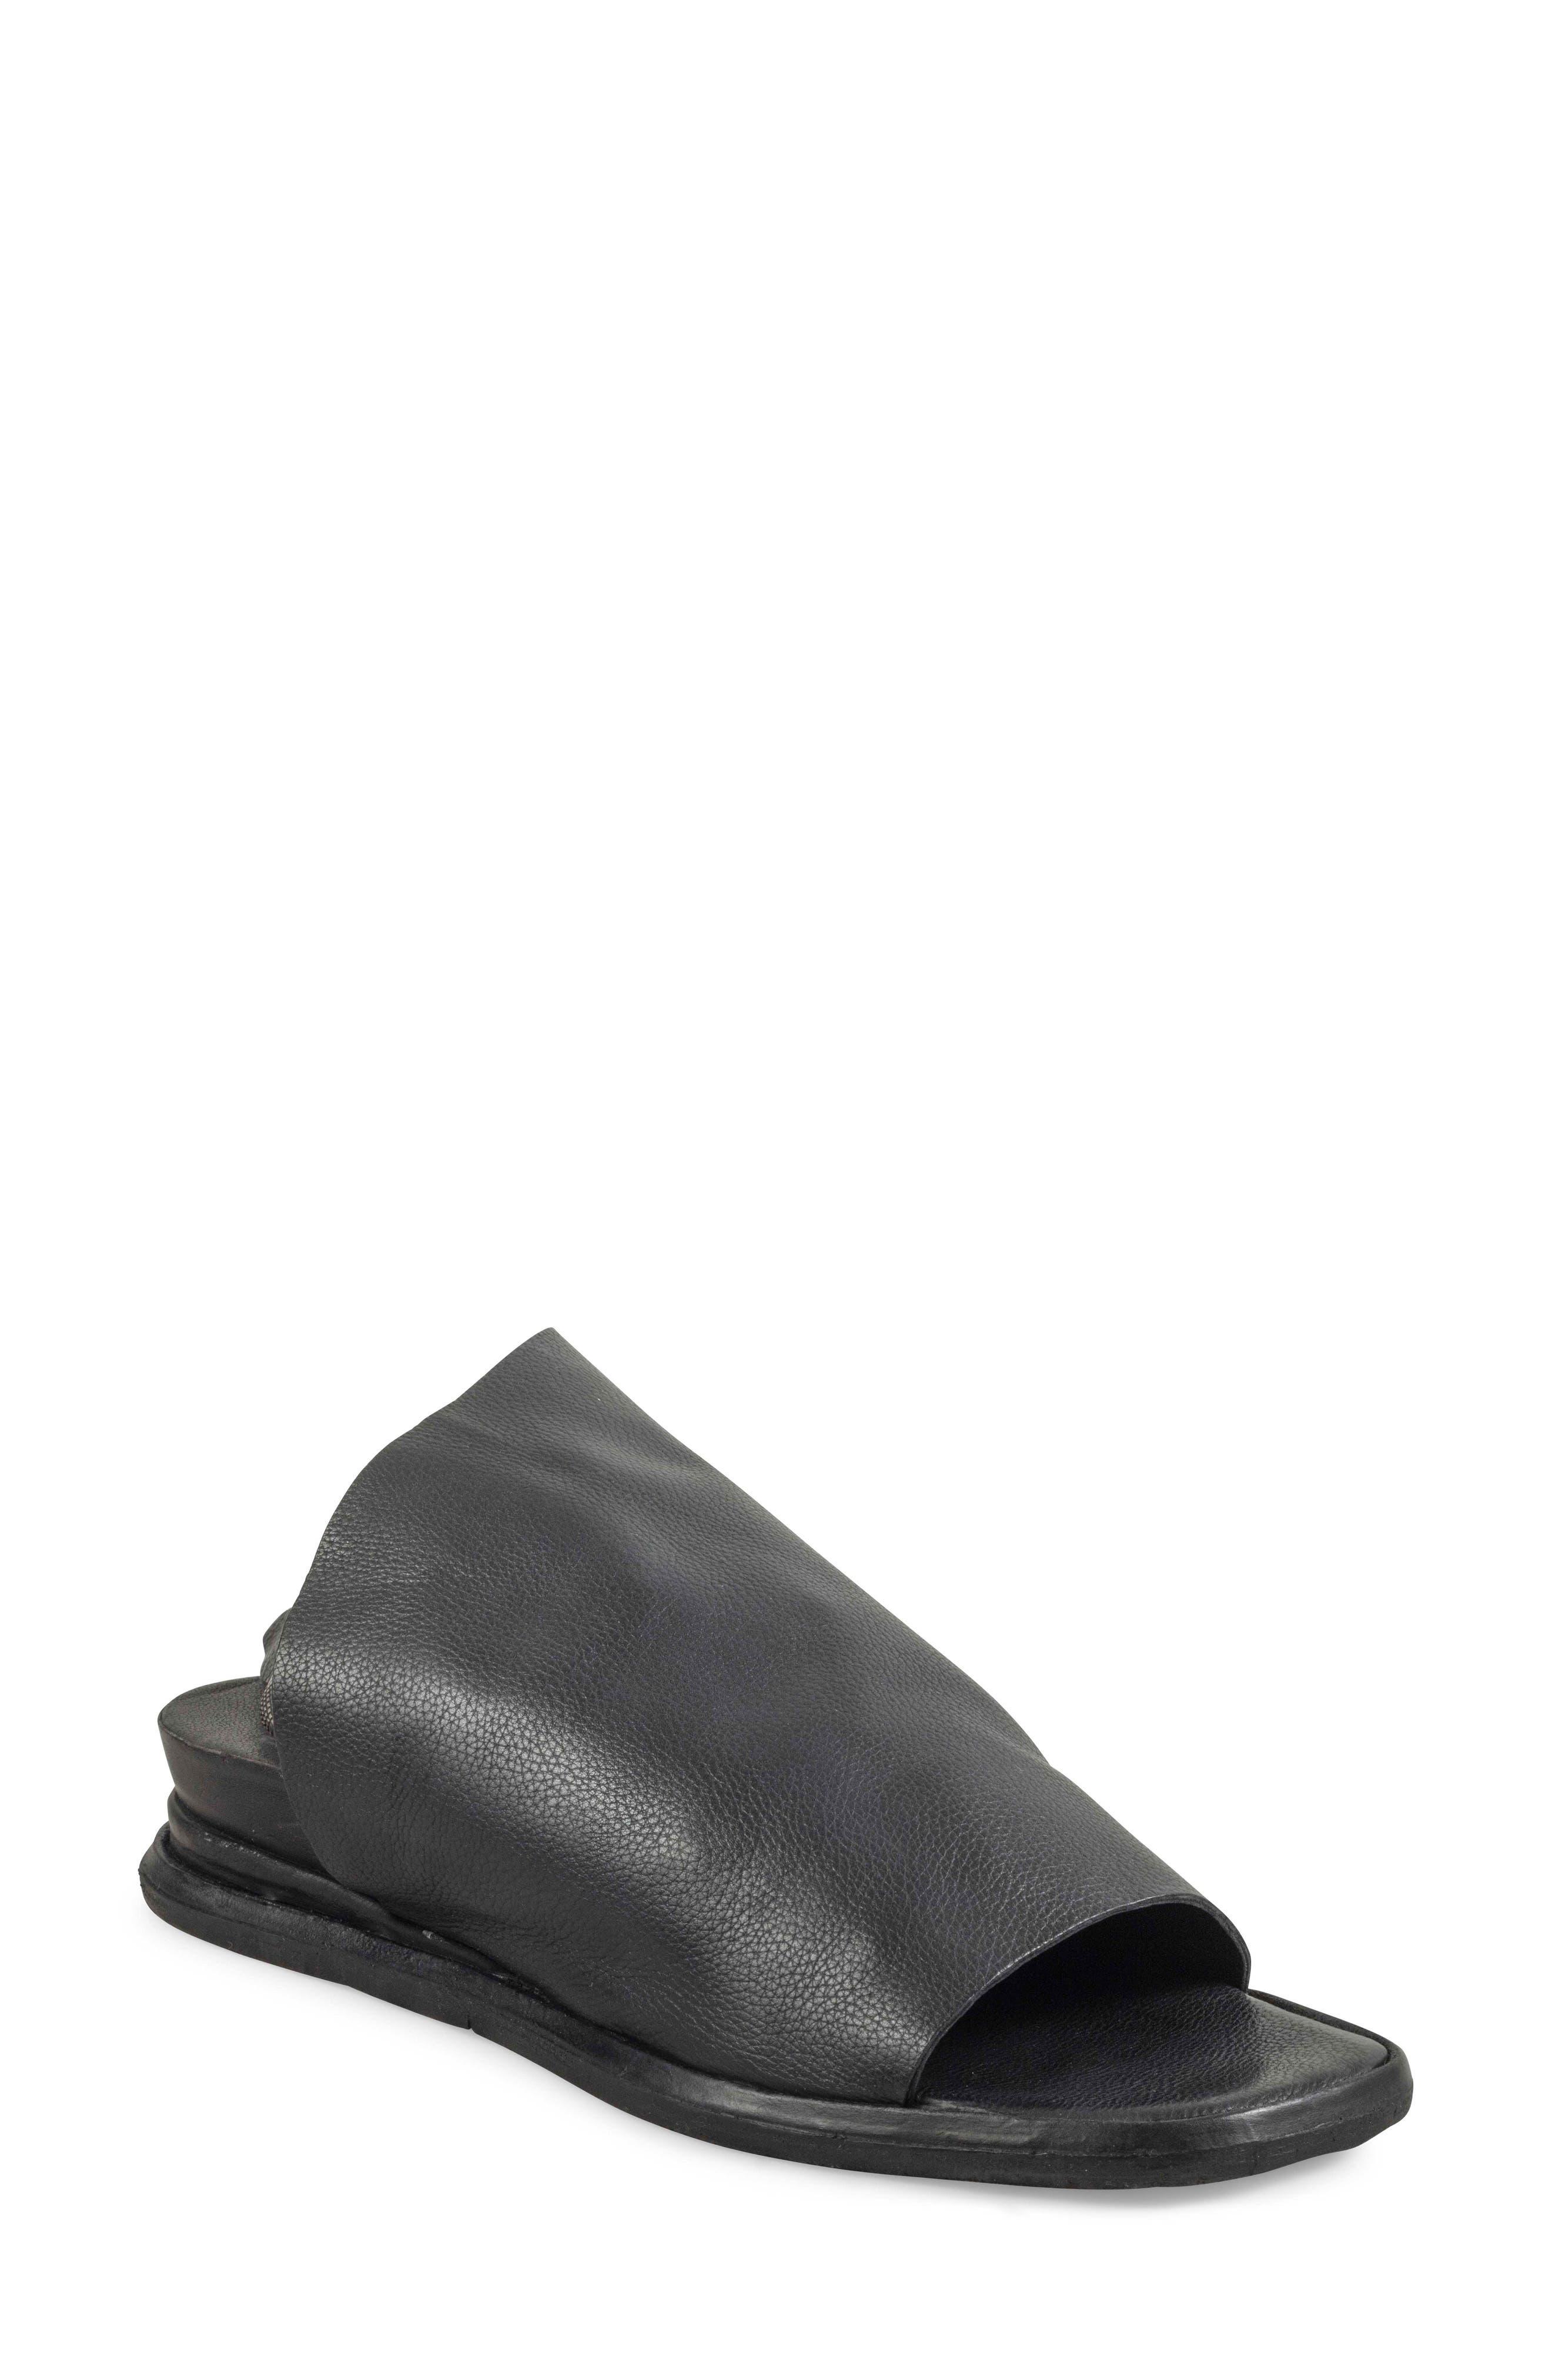 A.s.98 Siv Sandal - Black